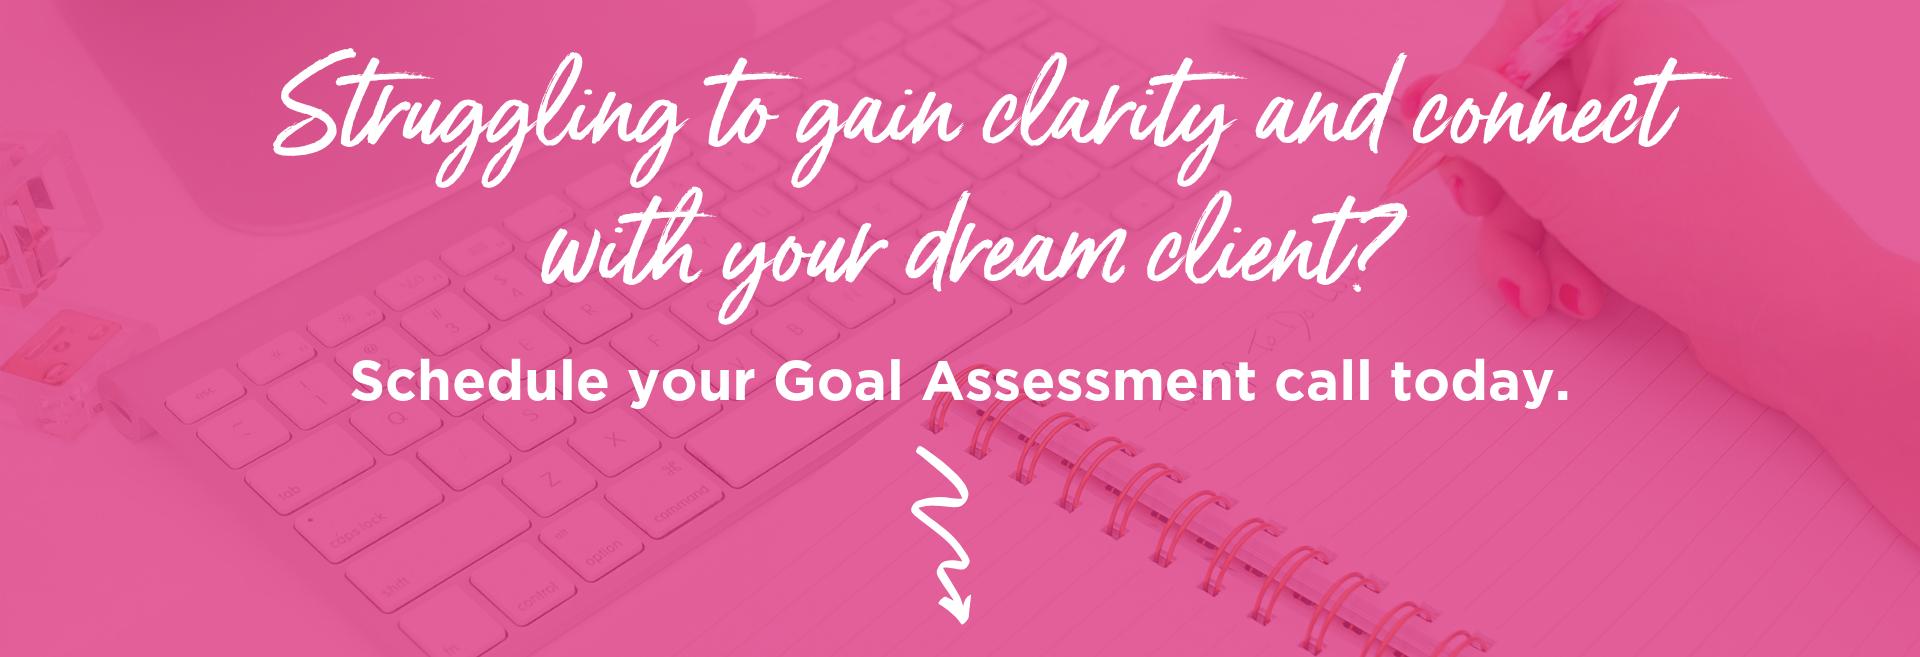 Goal Assessment .png